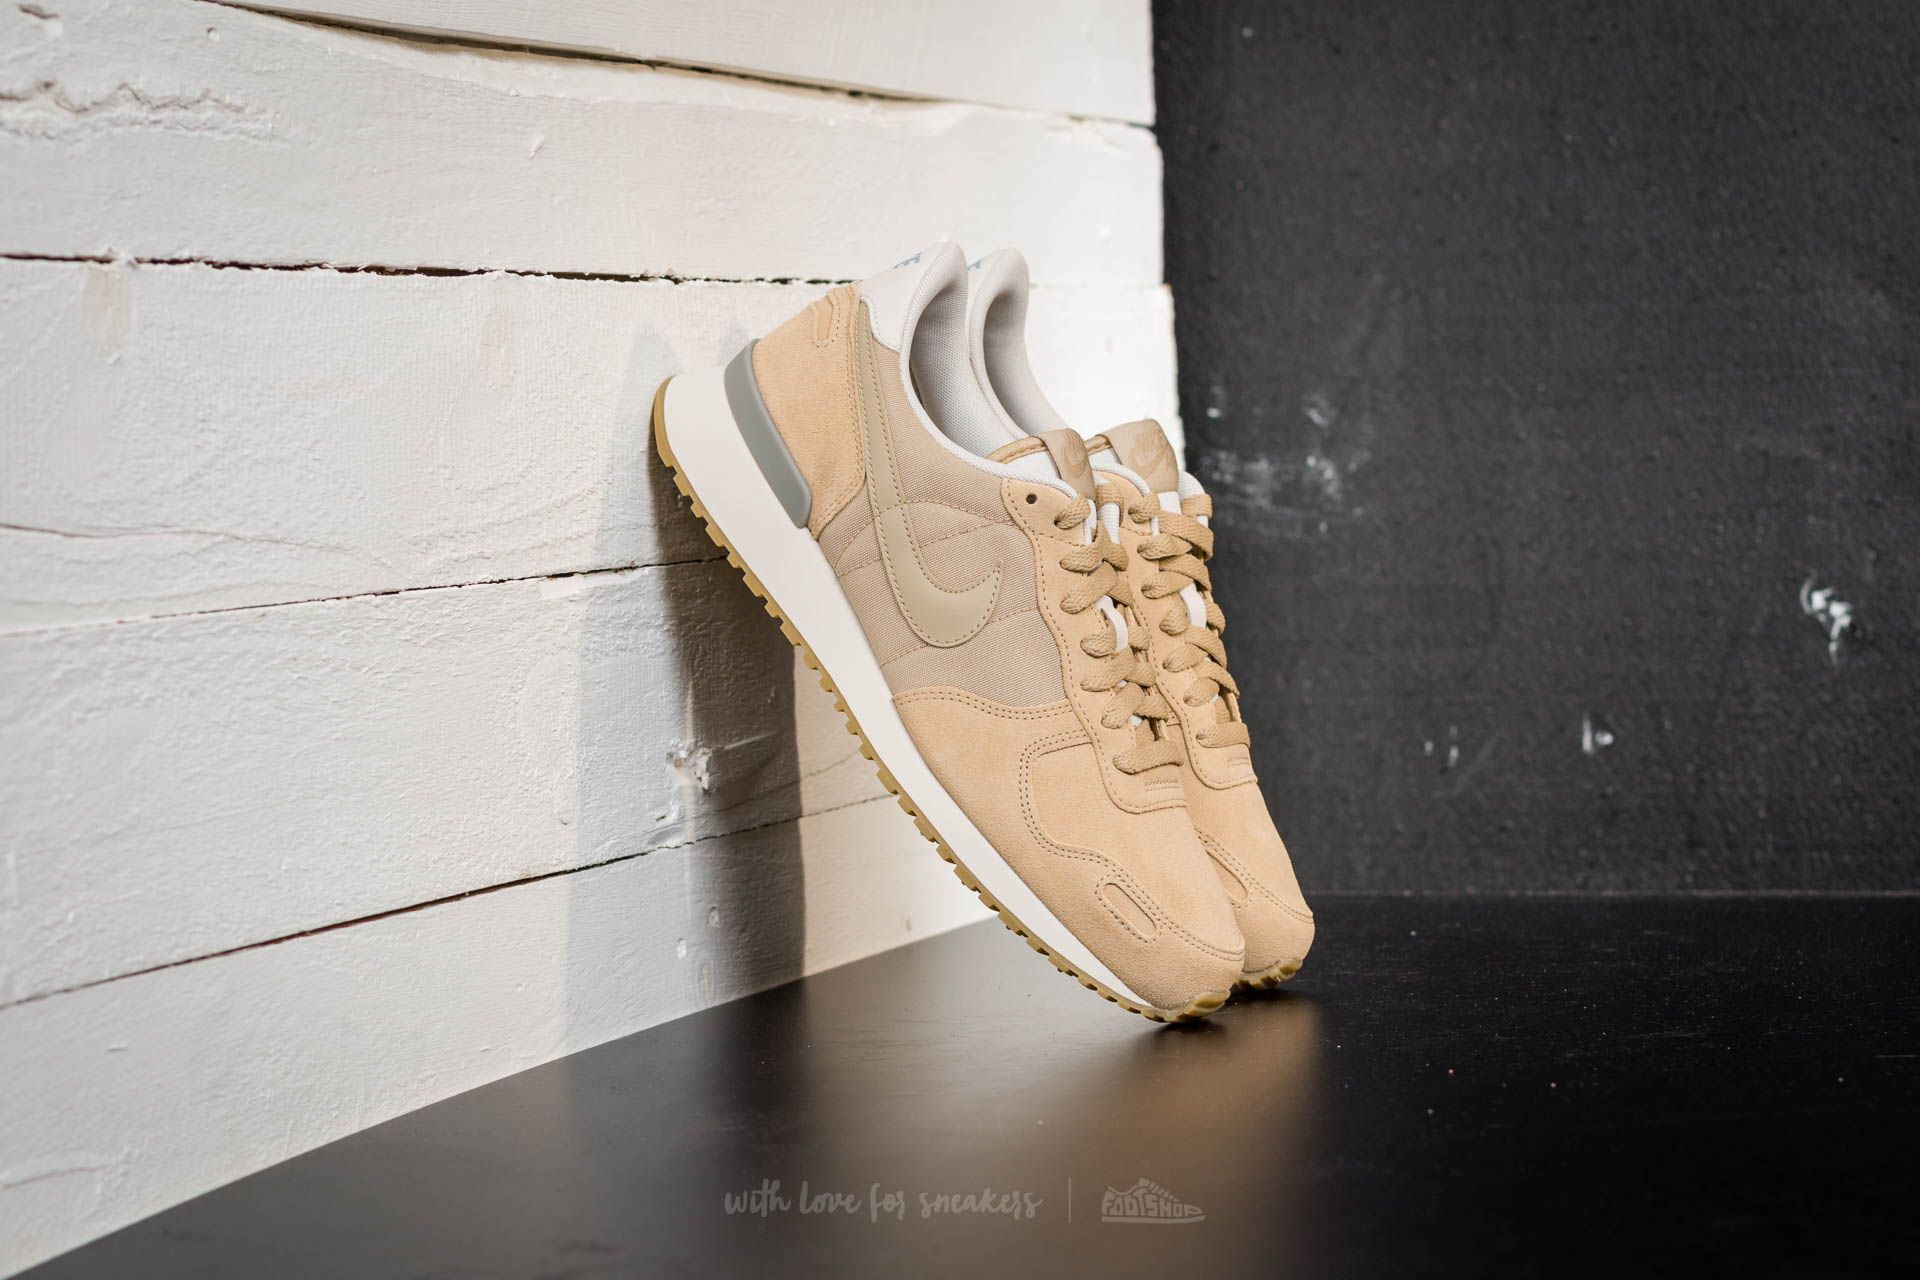 baño Adicto Ten cuidado  Men's shoes Nike Air Max Vortex Leather Mushroom/ Mushroom